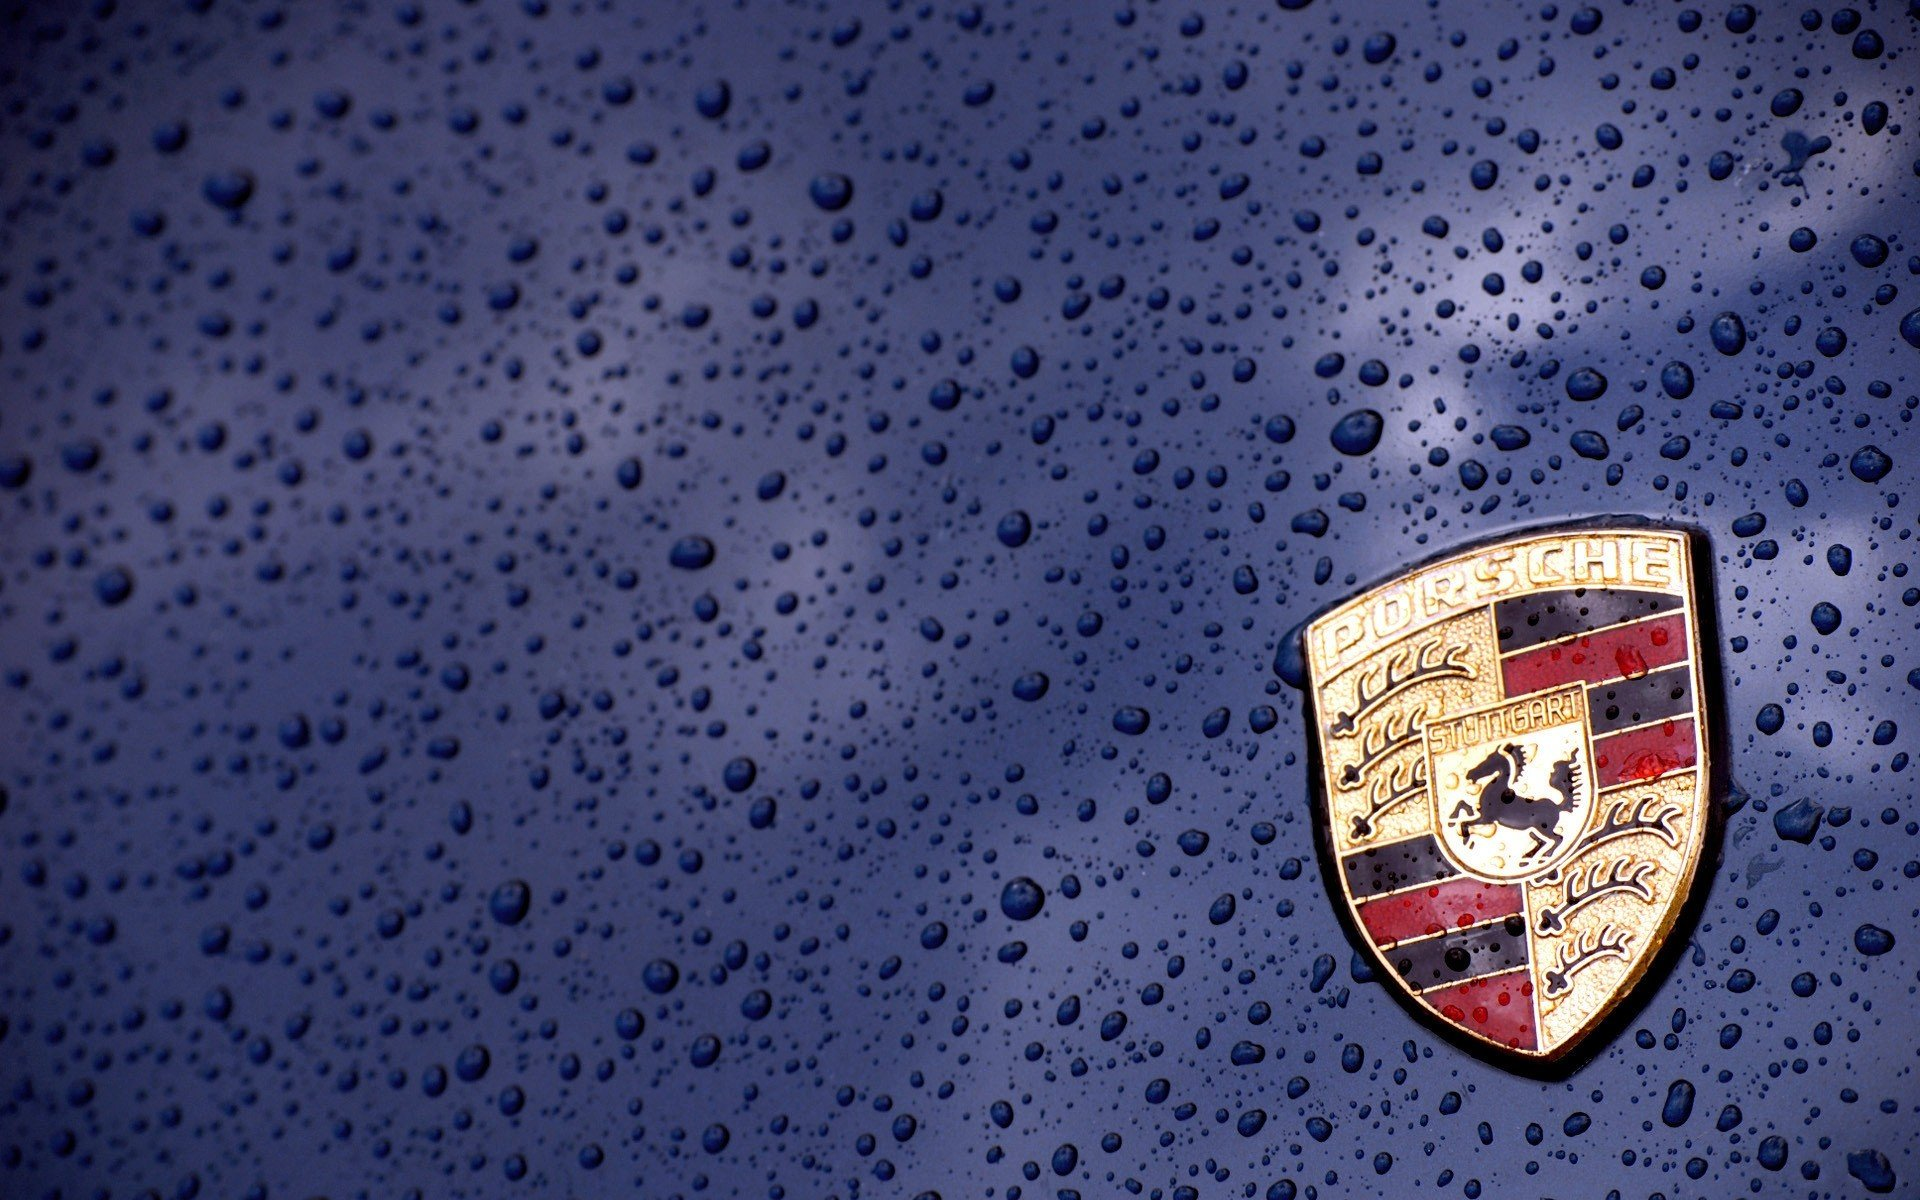 Porsche Logo Desktop HD Wallpaper 58890 1920x1200 px 1920x1200